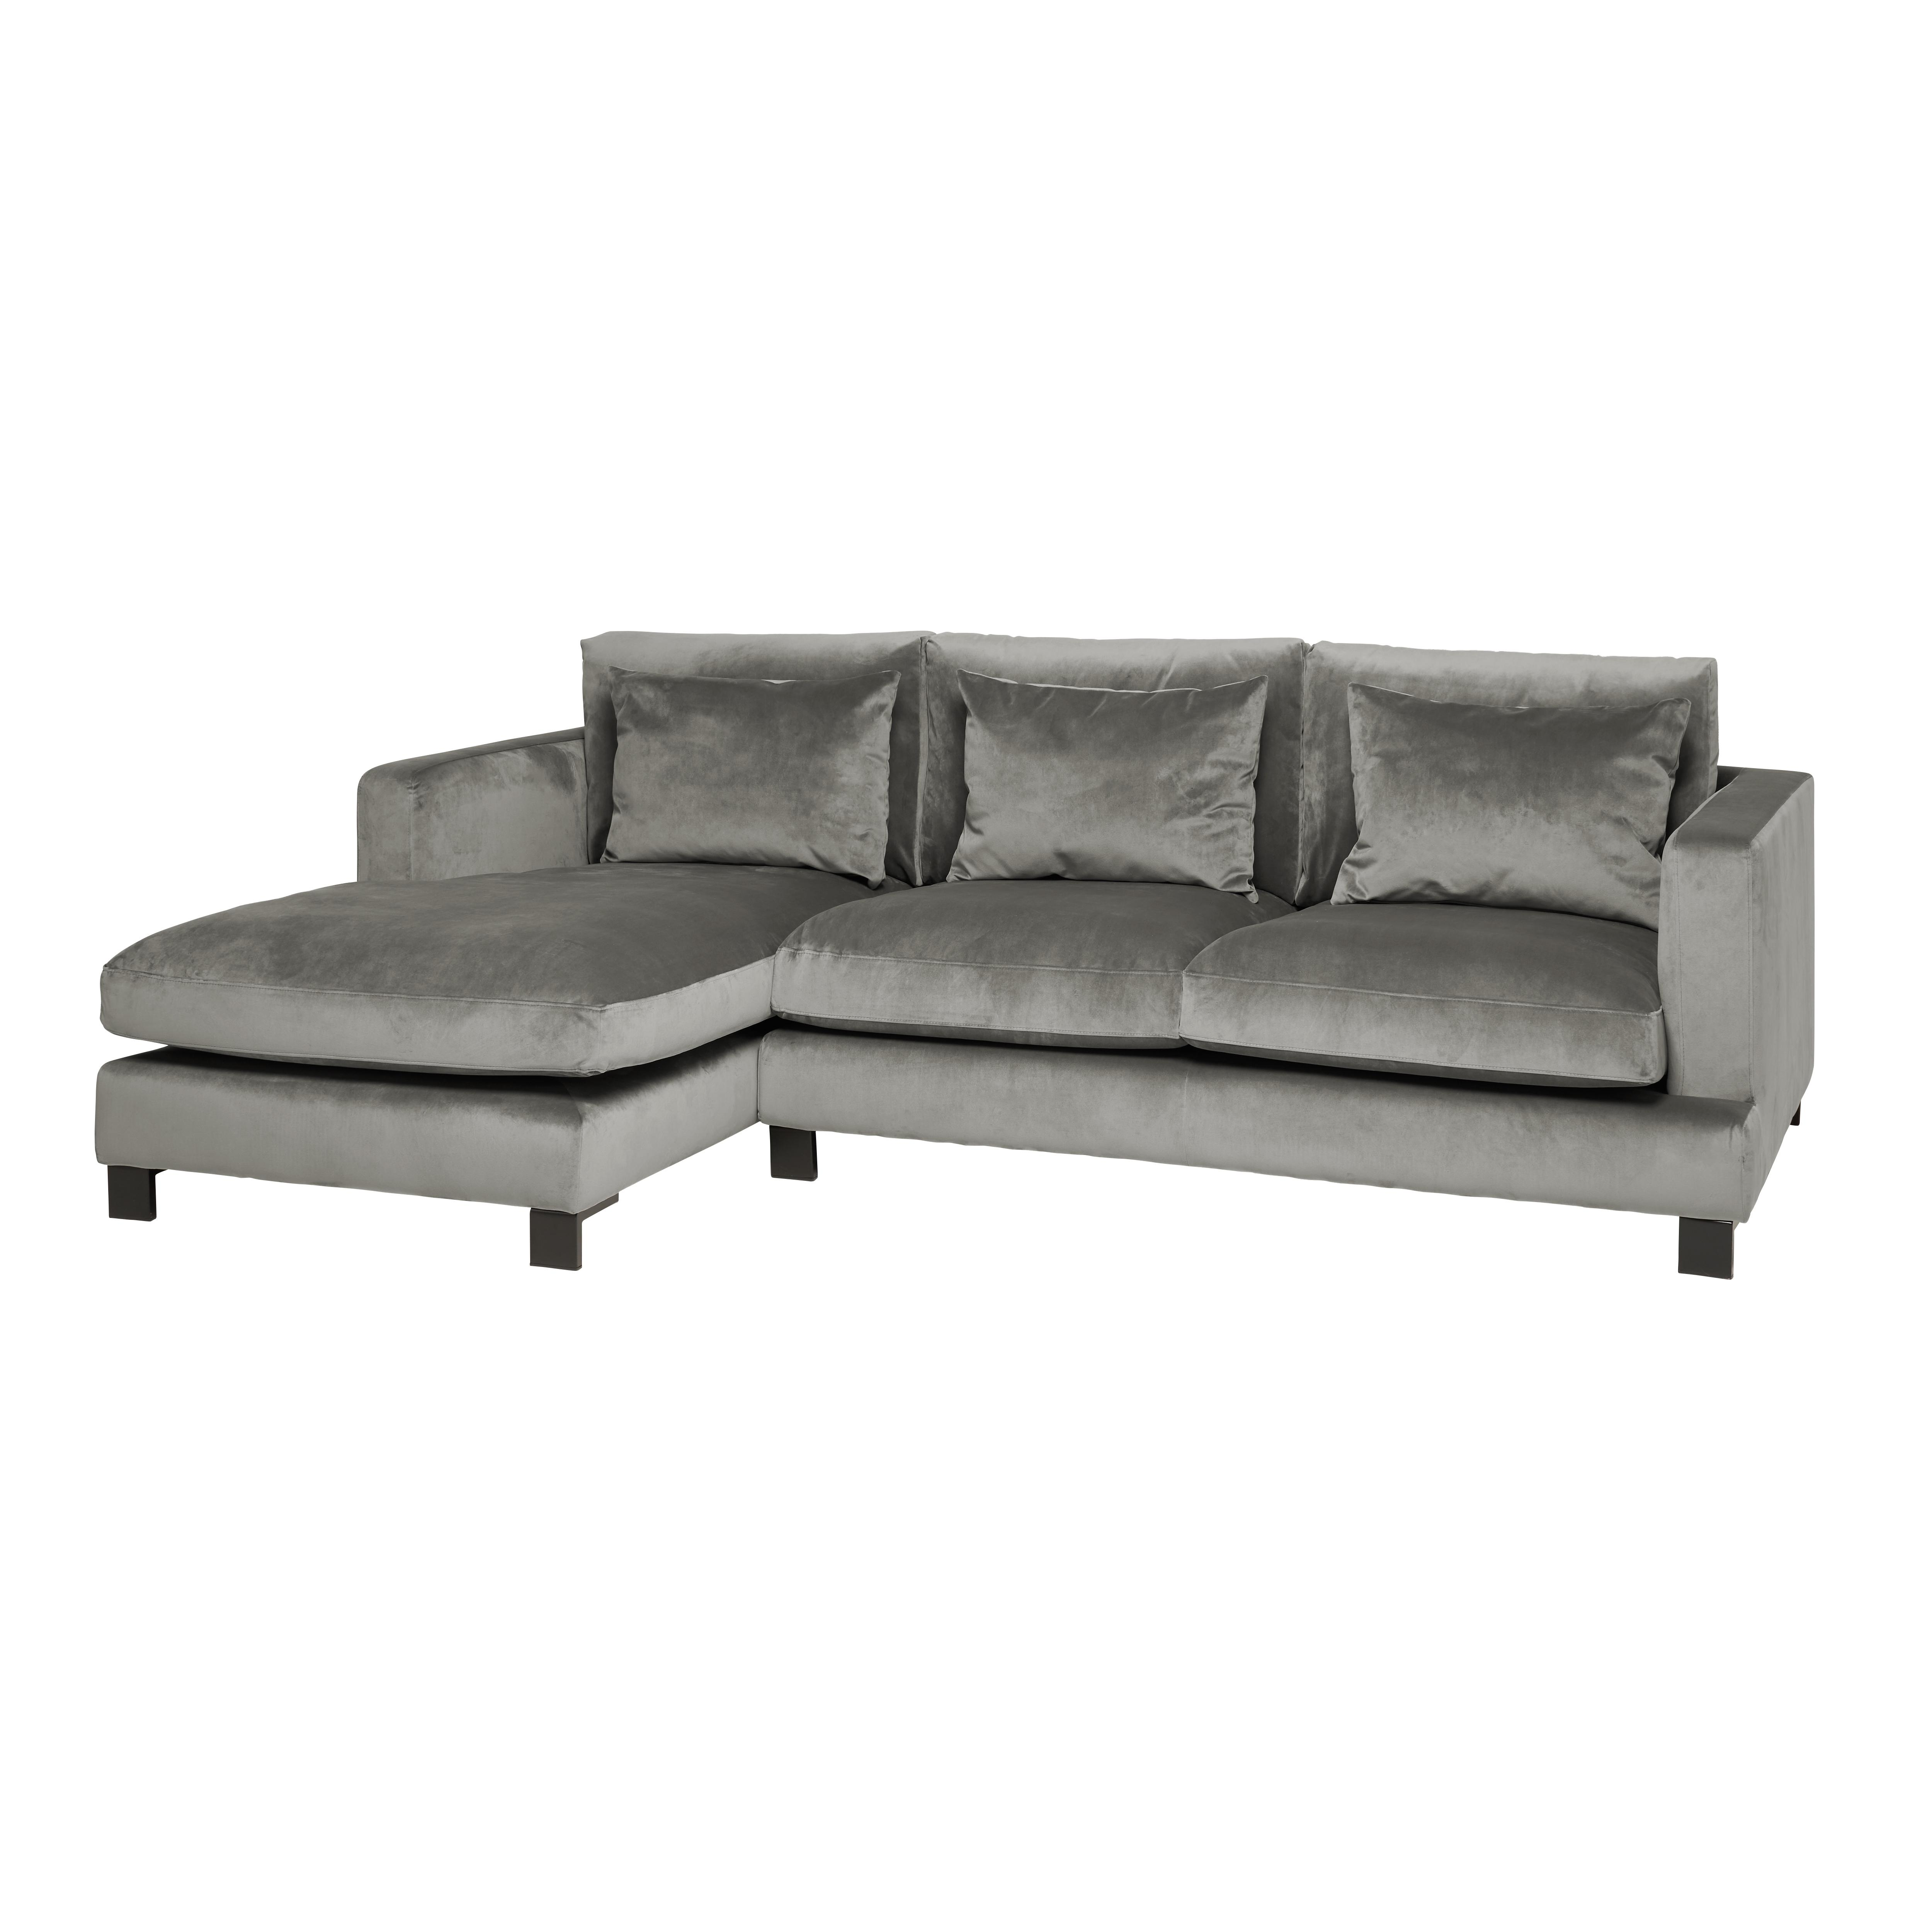 Lugano II left hand facing four seater chaise sofa alba velvet grey